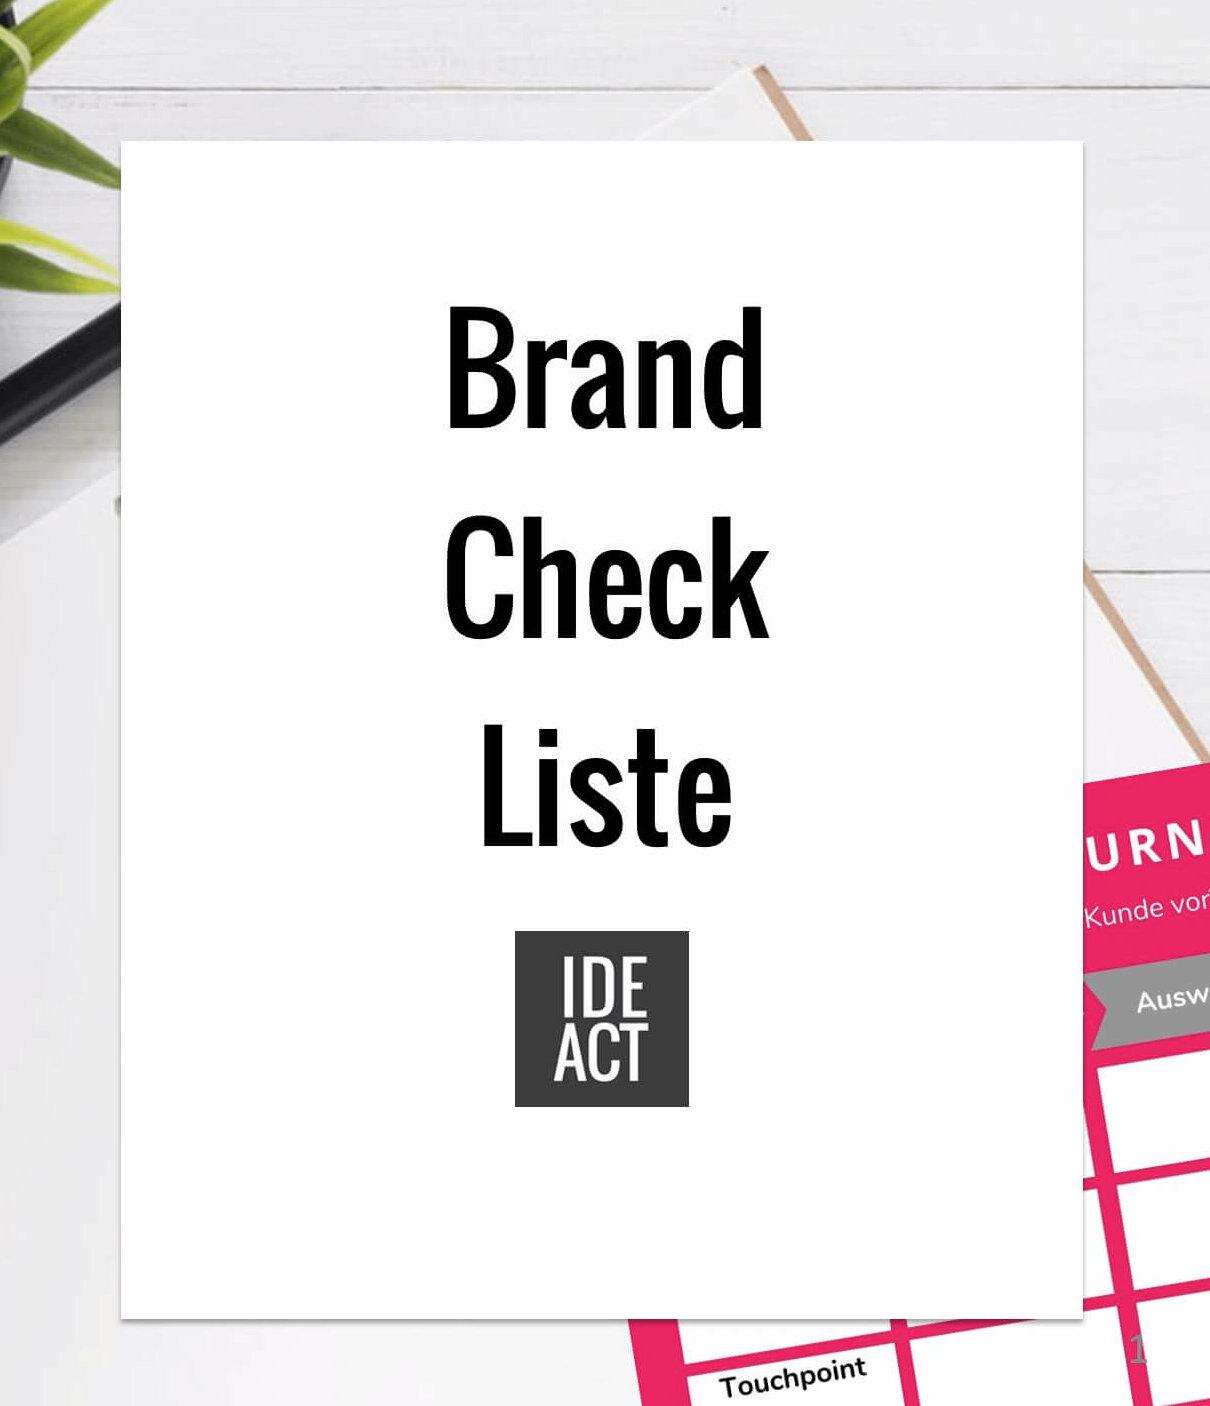 Brand Check Liste DEACT